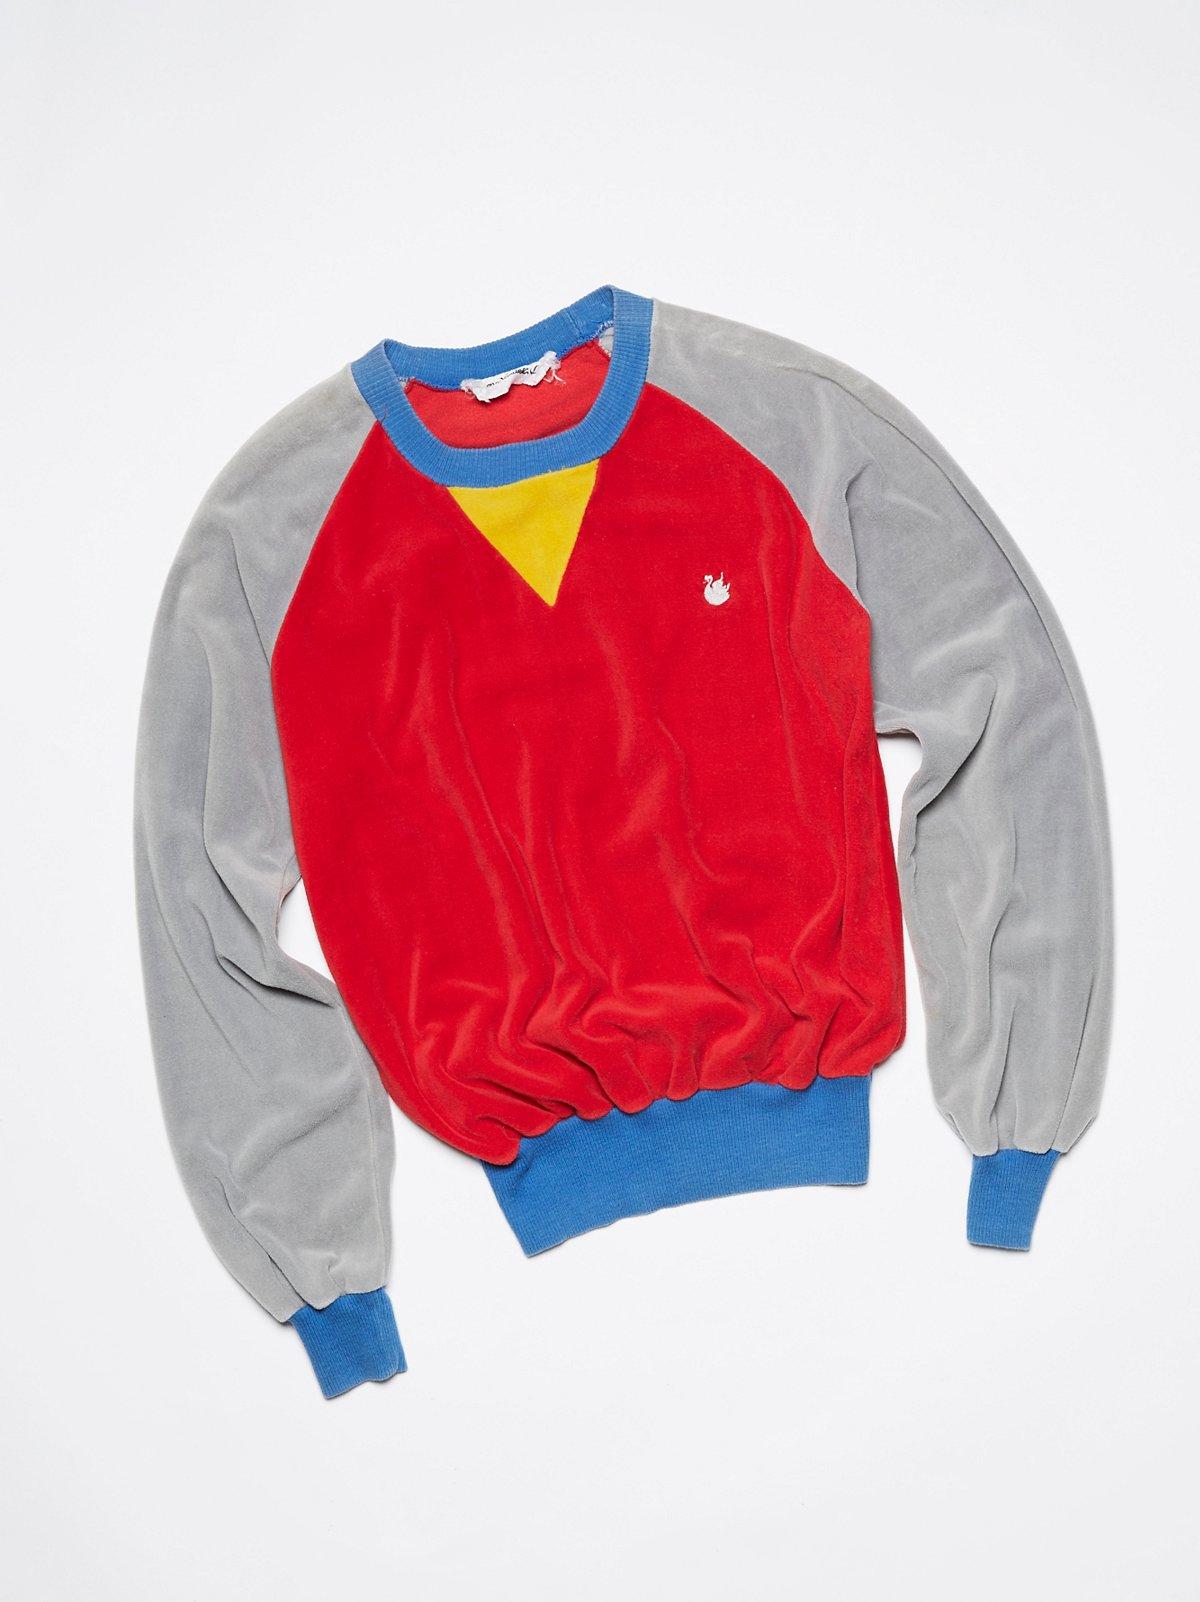 Vintage 1980s DVF Pullover